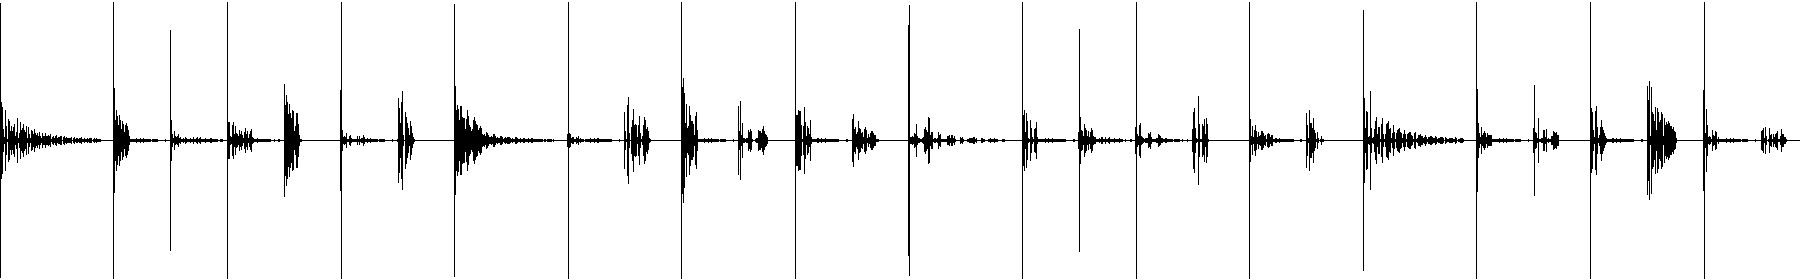 shg percussion loop 22